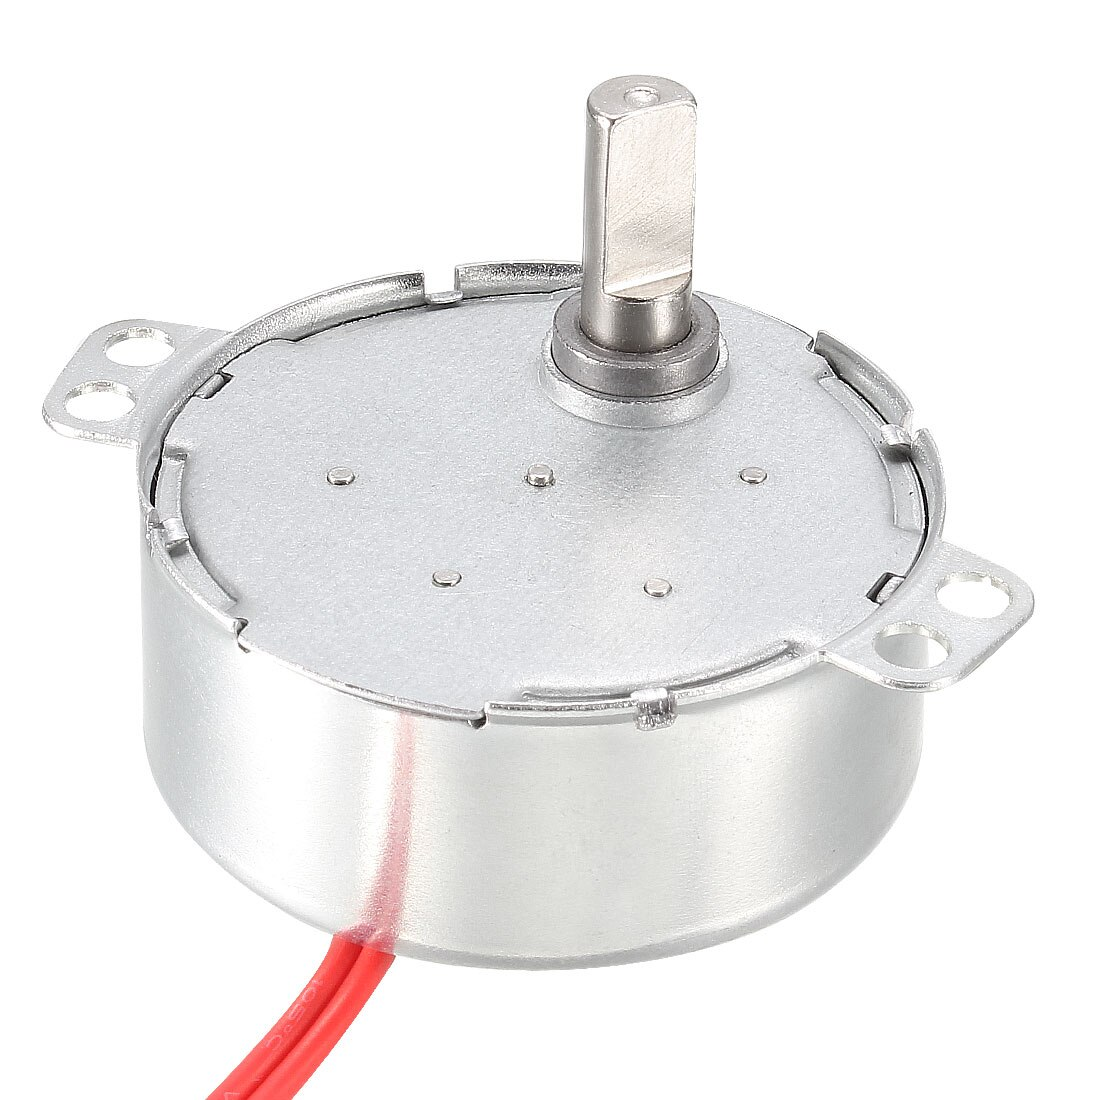 Uxcell síncrono Motor Synchron AC 12V W 4W 5-6 RPM/MIN 50-60Hz CCW para hecho a mano